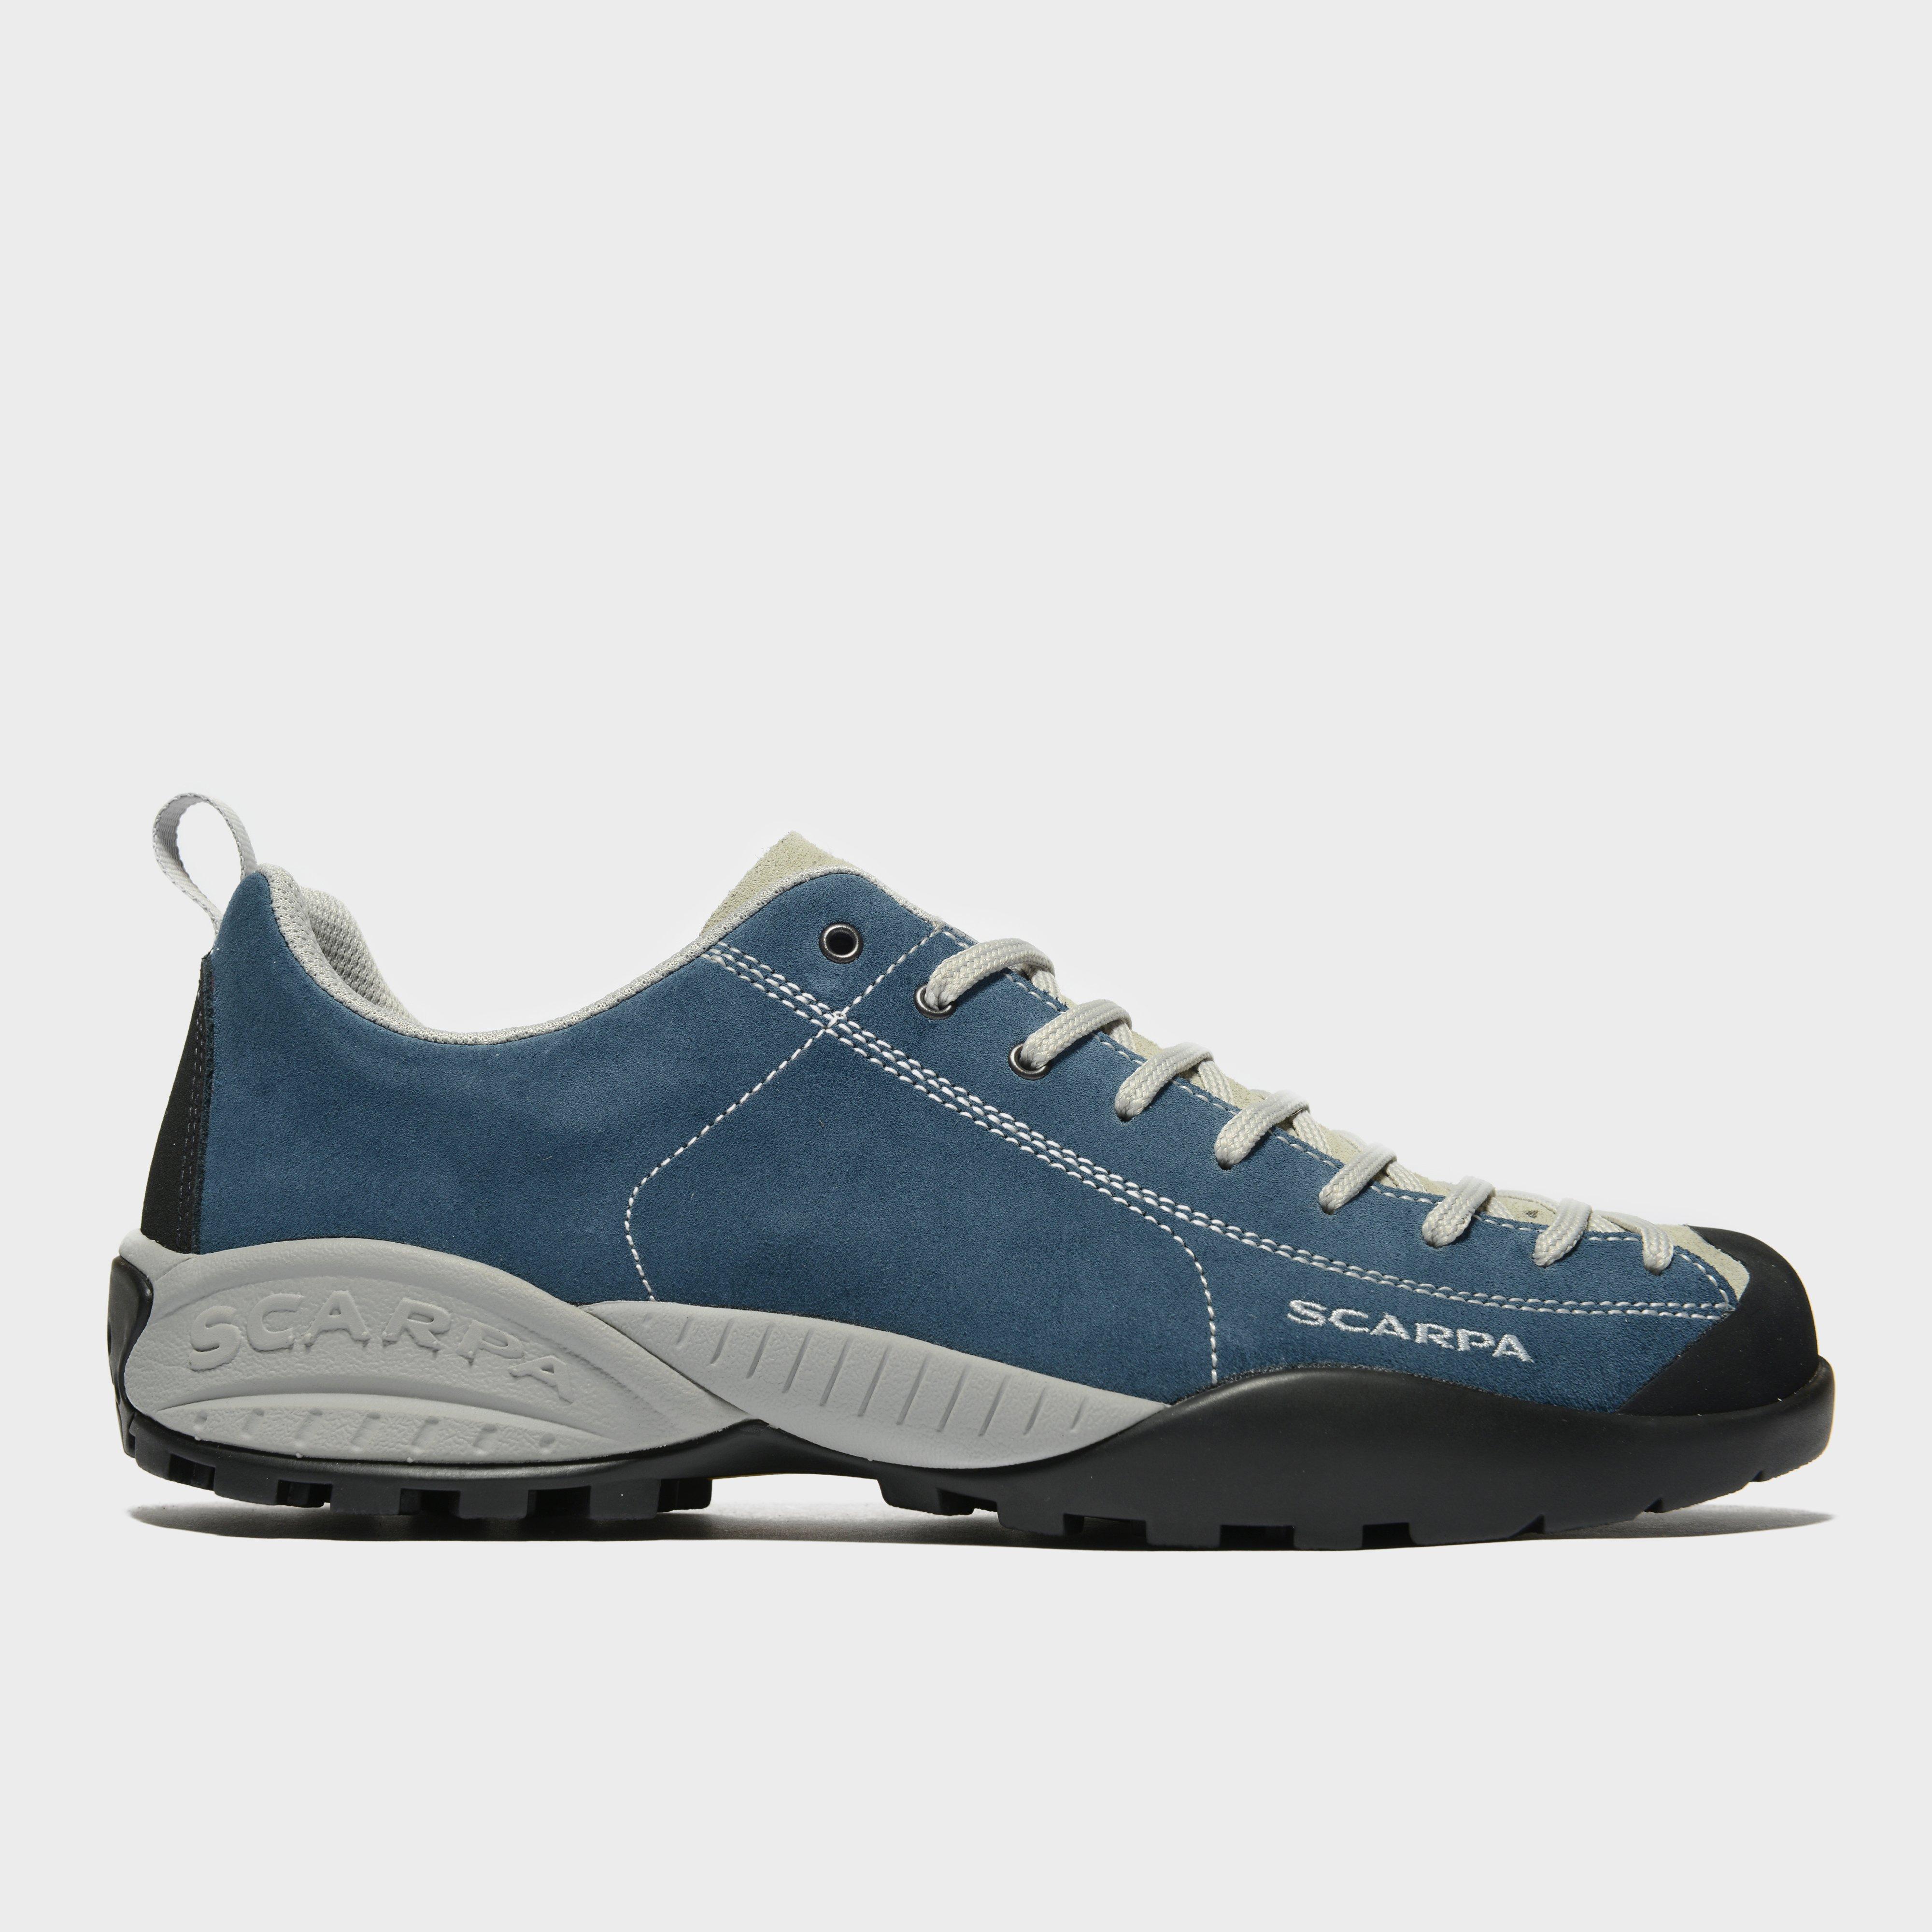 Scarpa Mens Mojito Shoes Blue